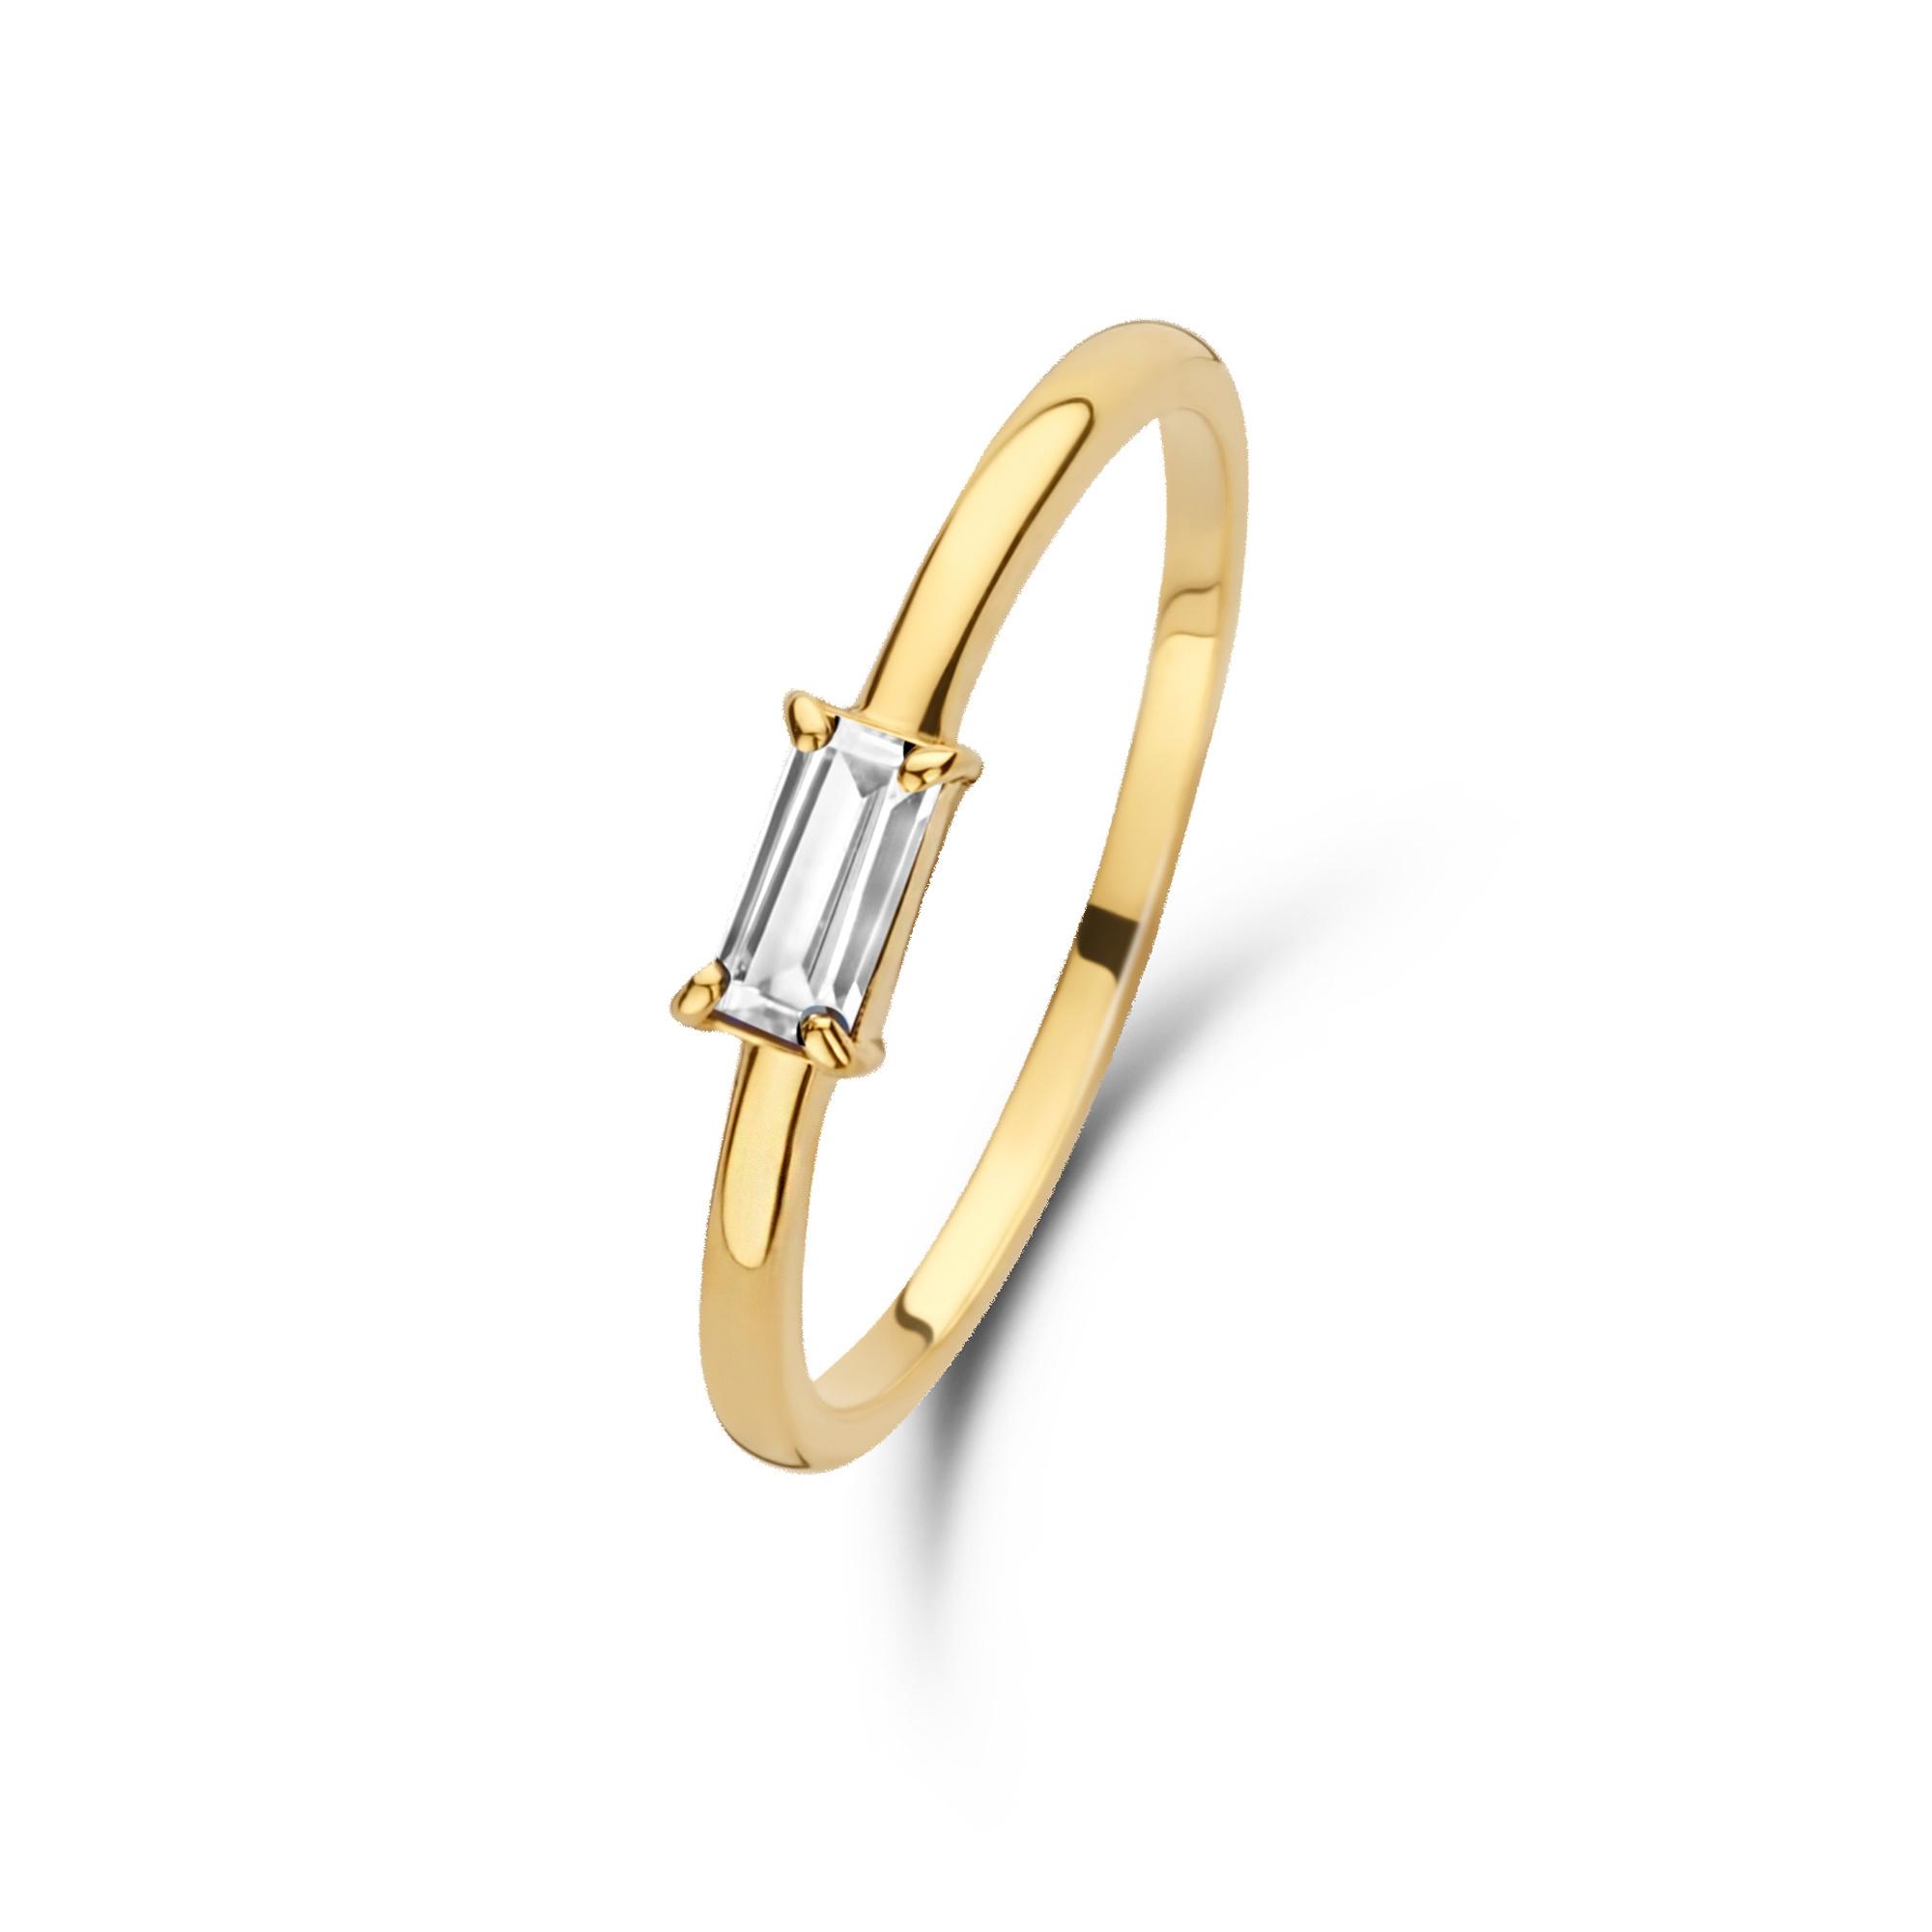 Isabel Bernard Baguette Odie anello in oro 14 carati